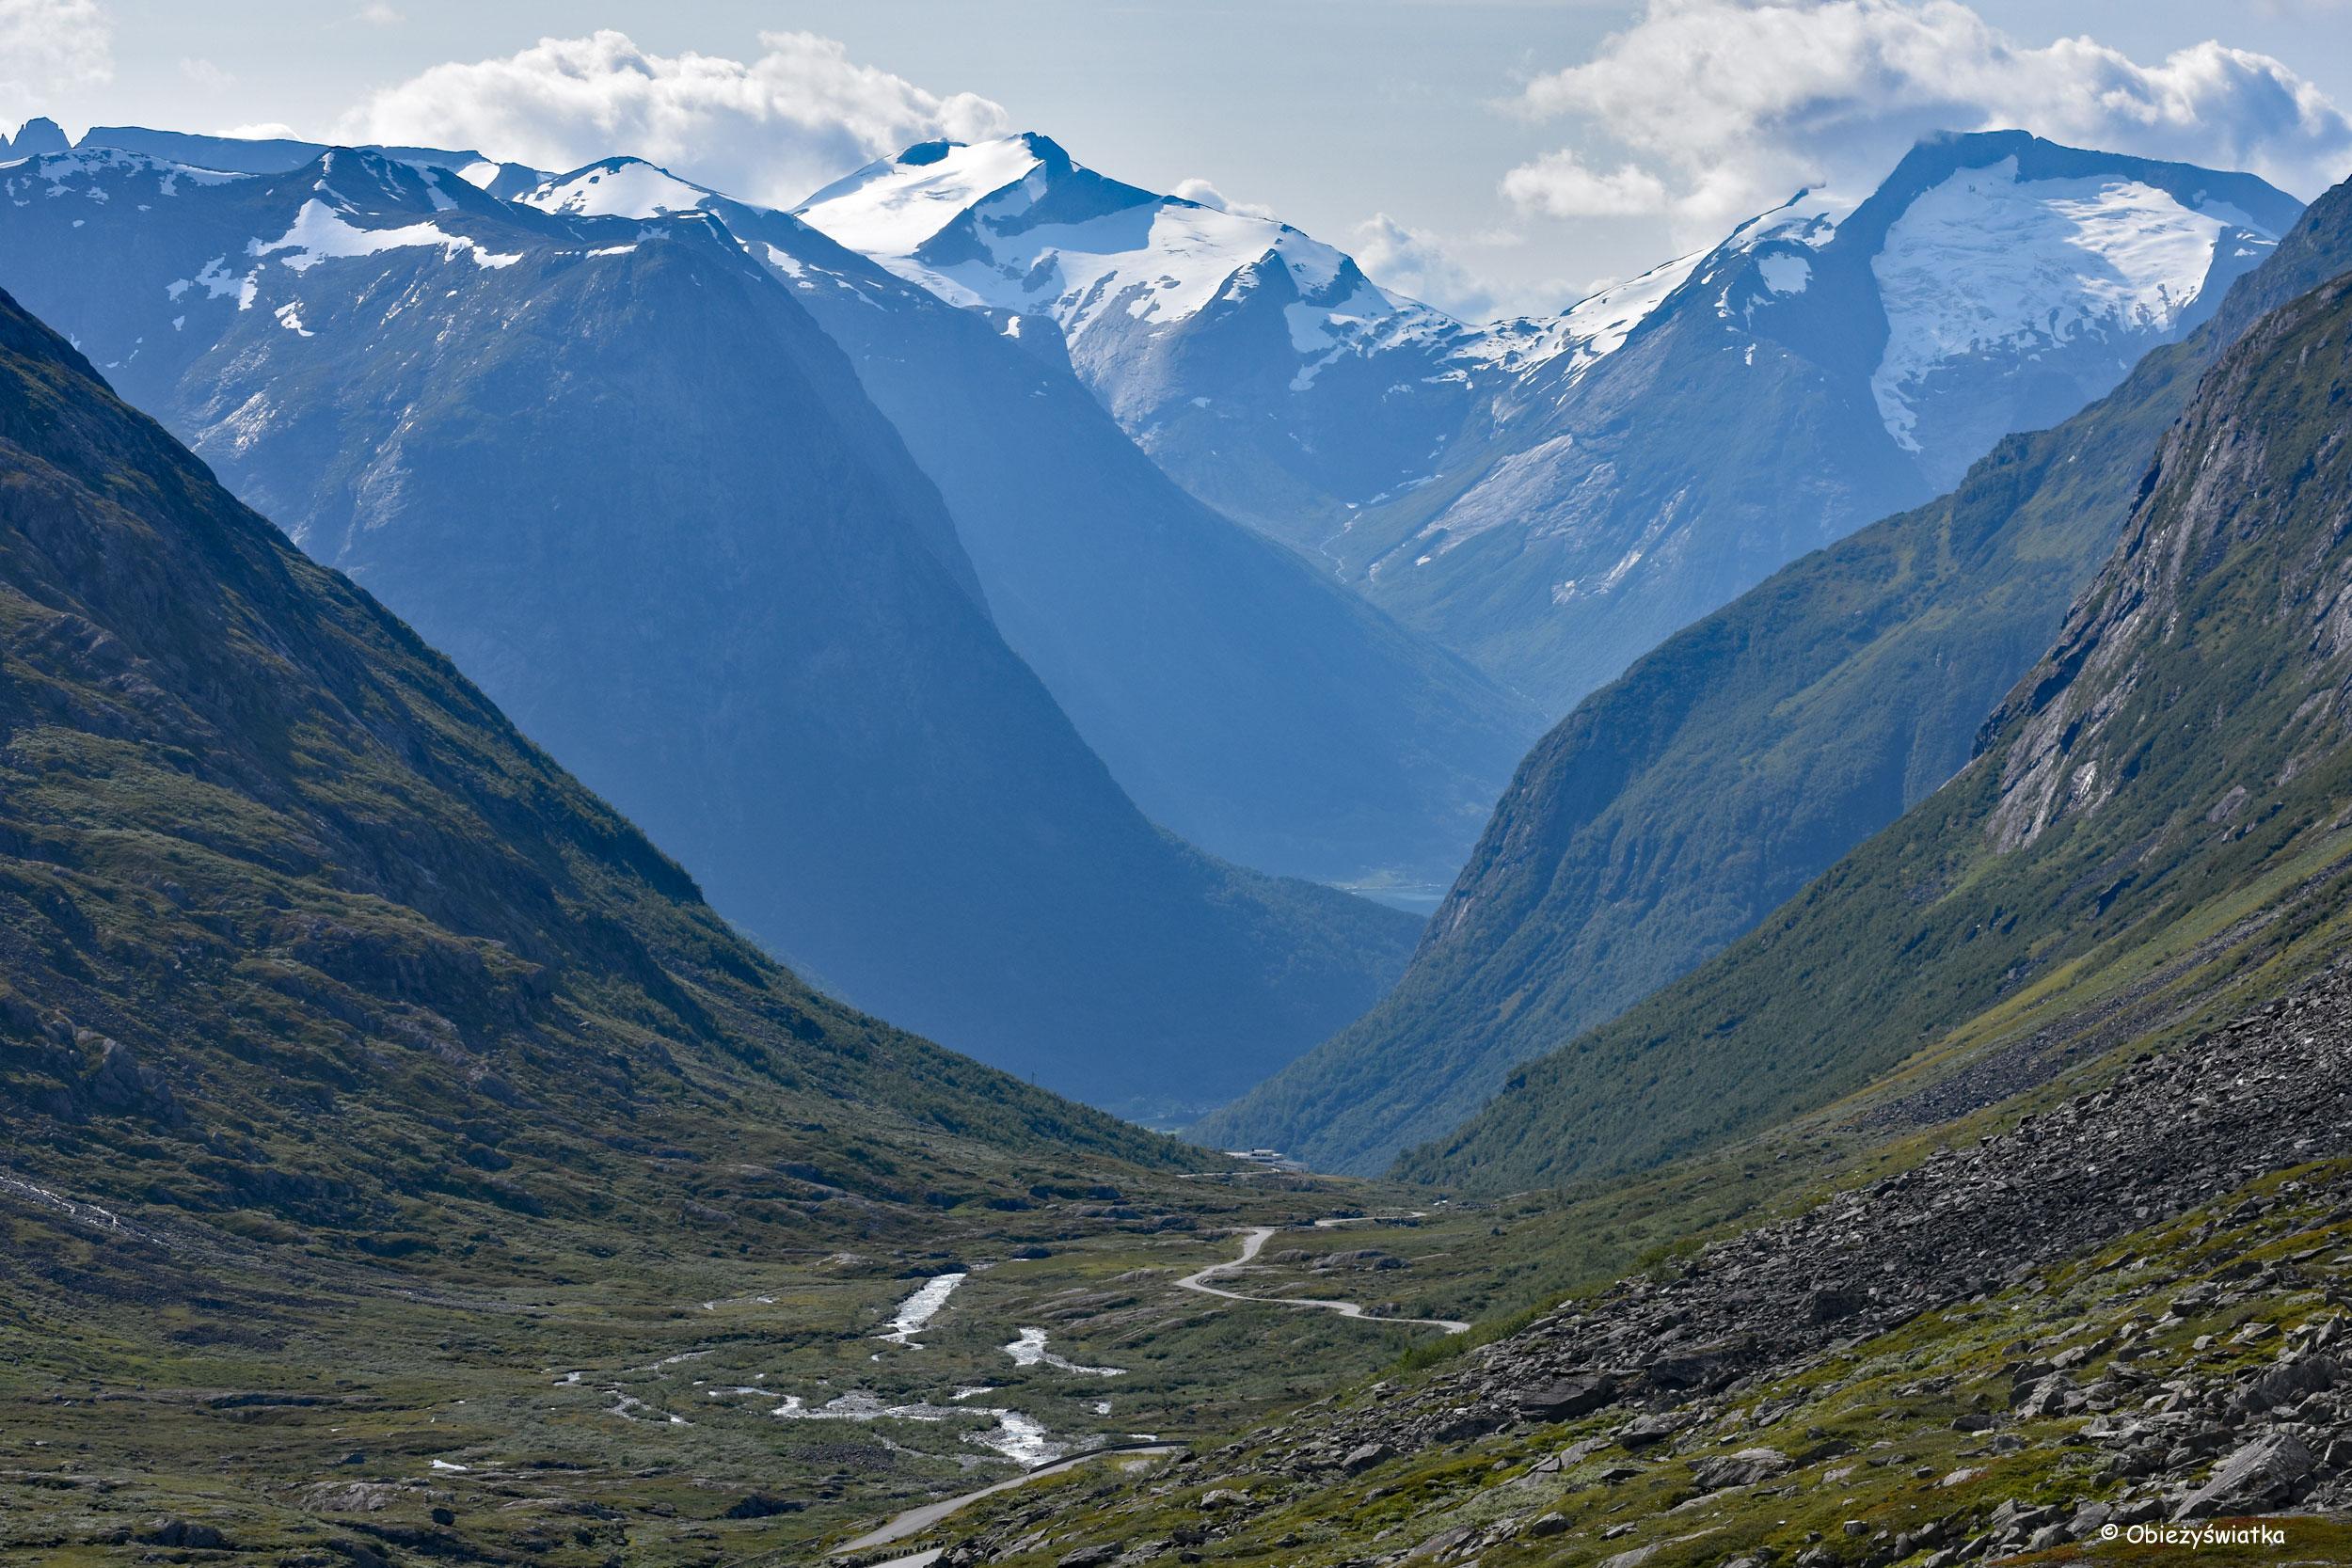 Droga jest celem - Gamle Strynefjellsvegen, Norwegia